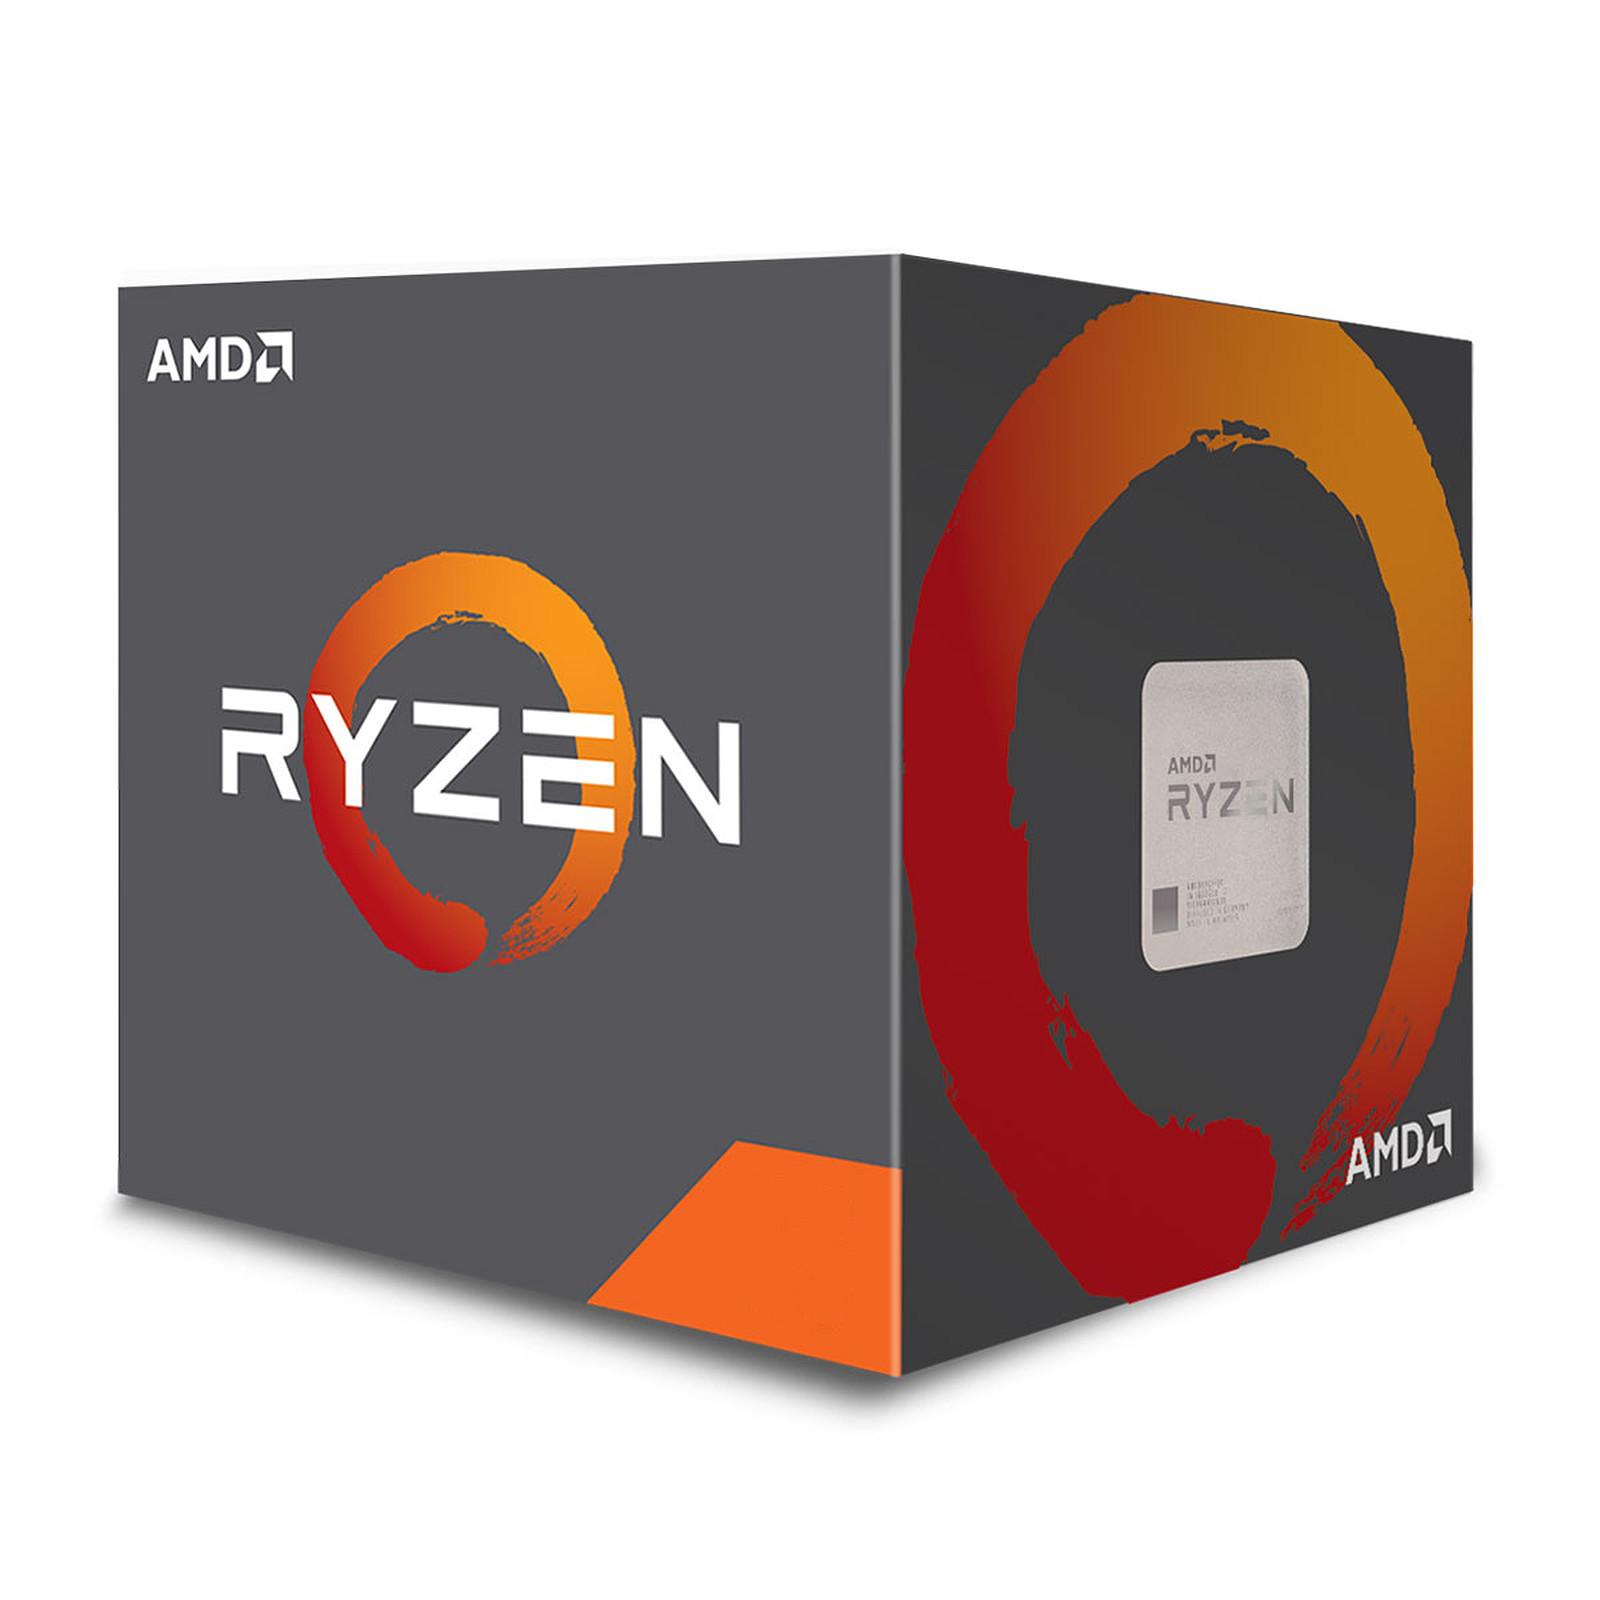 AMD Ryzen 3 1200 Wraith Stealth Edition (3.1 GHz)